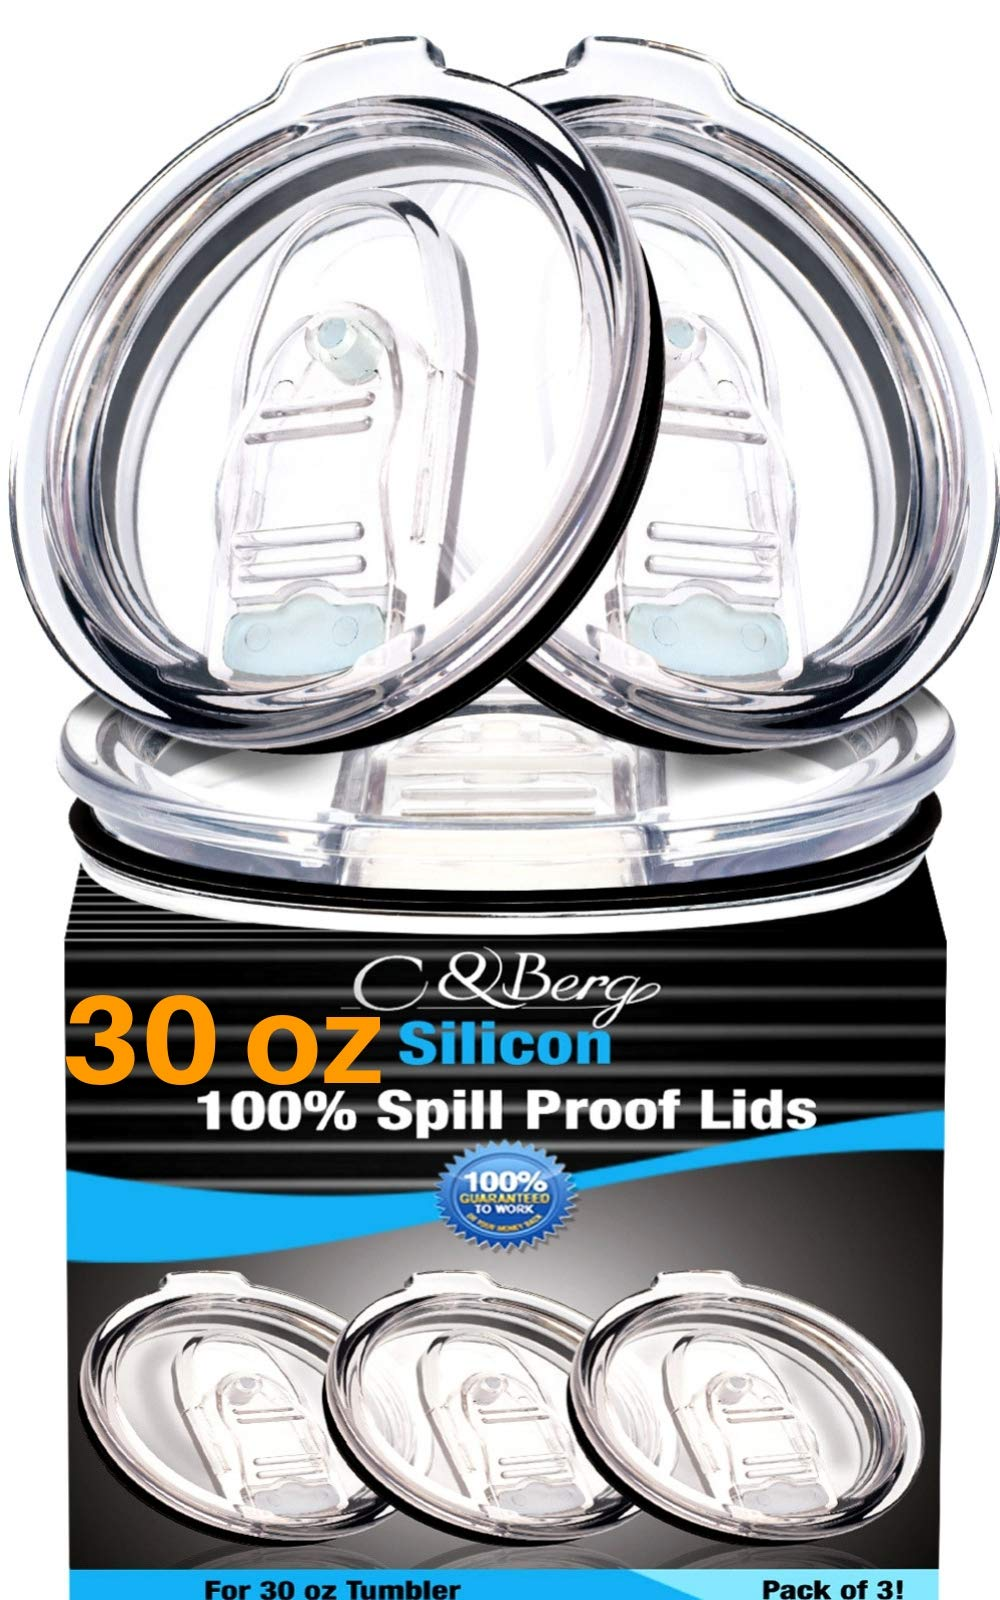 3 Yeti Lids 30 oz Spill Proof - No Leak & Splash Proof Replacement Silicon Slider Locking Closure, 3 Lids for Tumbler, Fit Ozark, Open/Close 3.5 Inch Diameter by C&Berg Model 2019